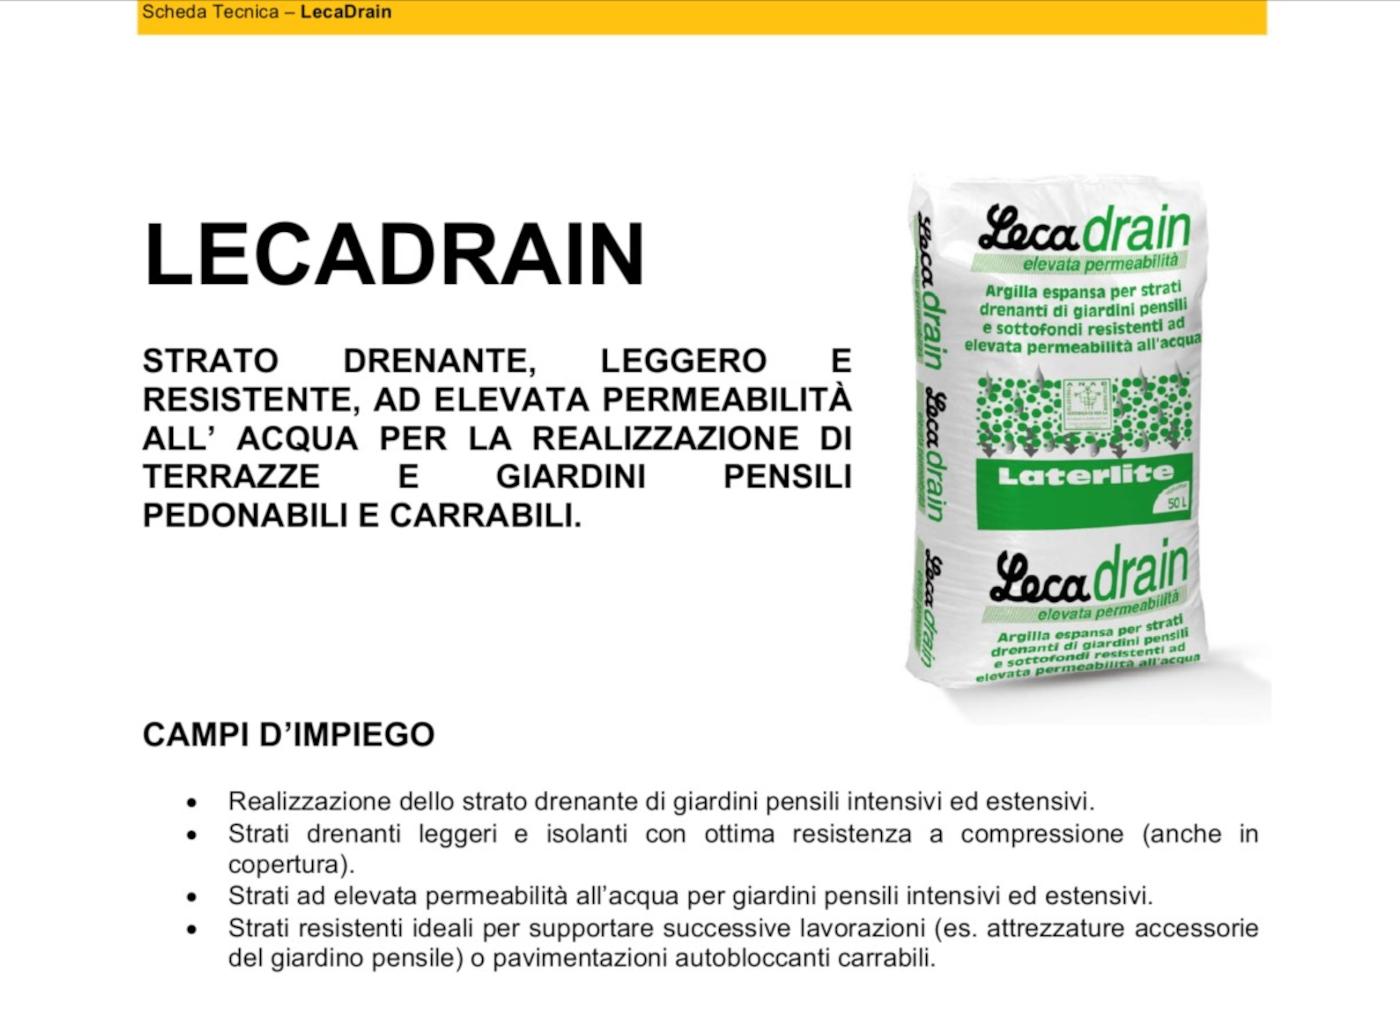 scheda-tecnica-lecadrain-P47